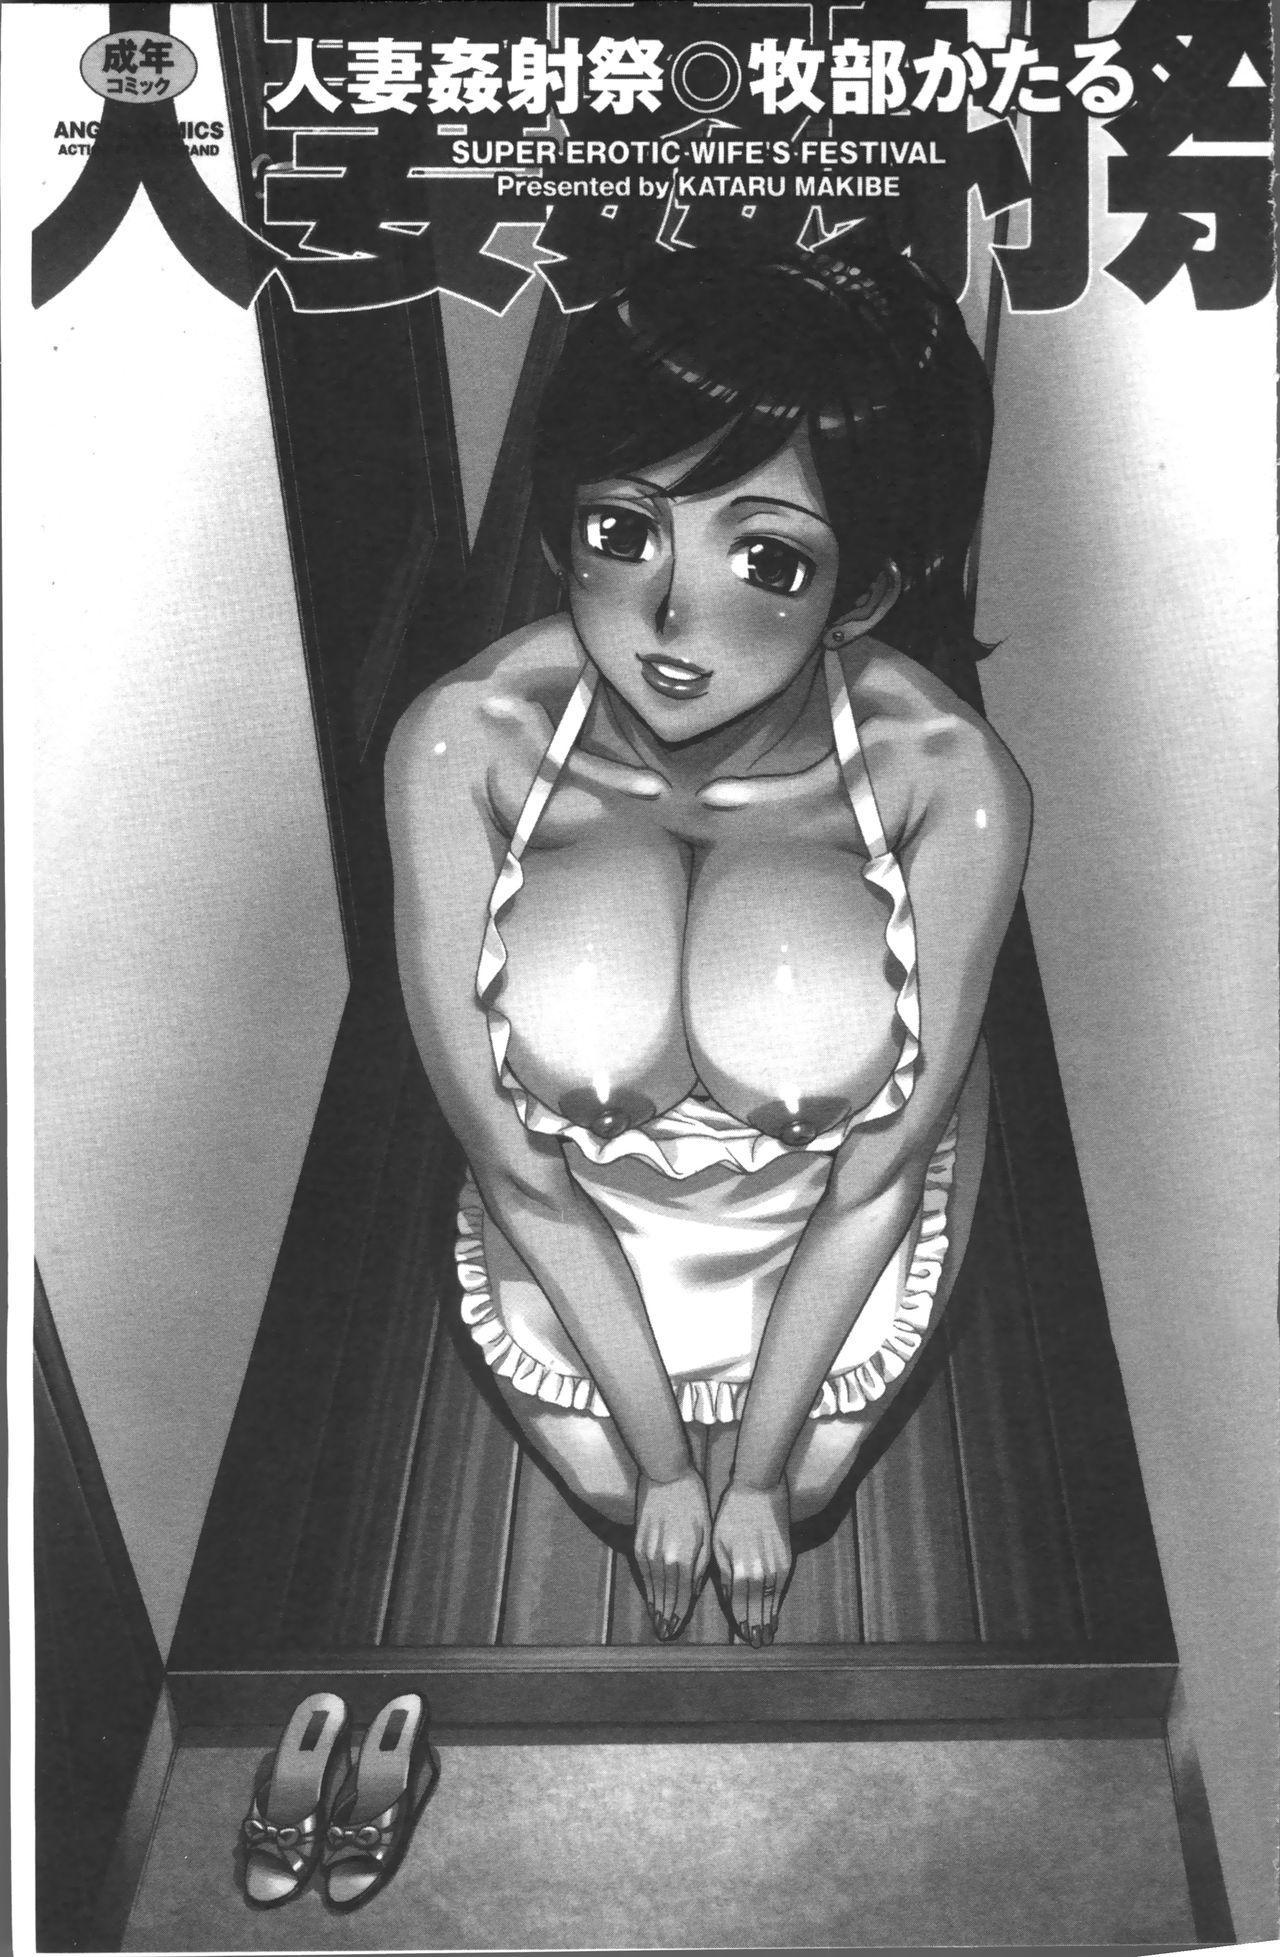 Hitozuma Kanshasai - SUPER EROTIC WIFE'S FESTIVAL 4